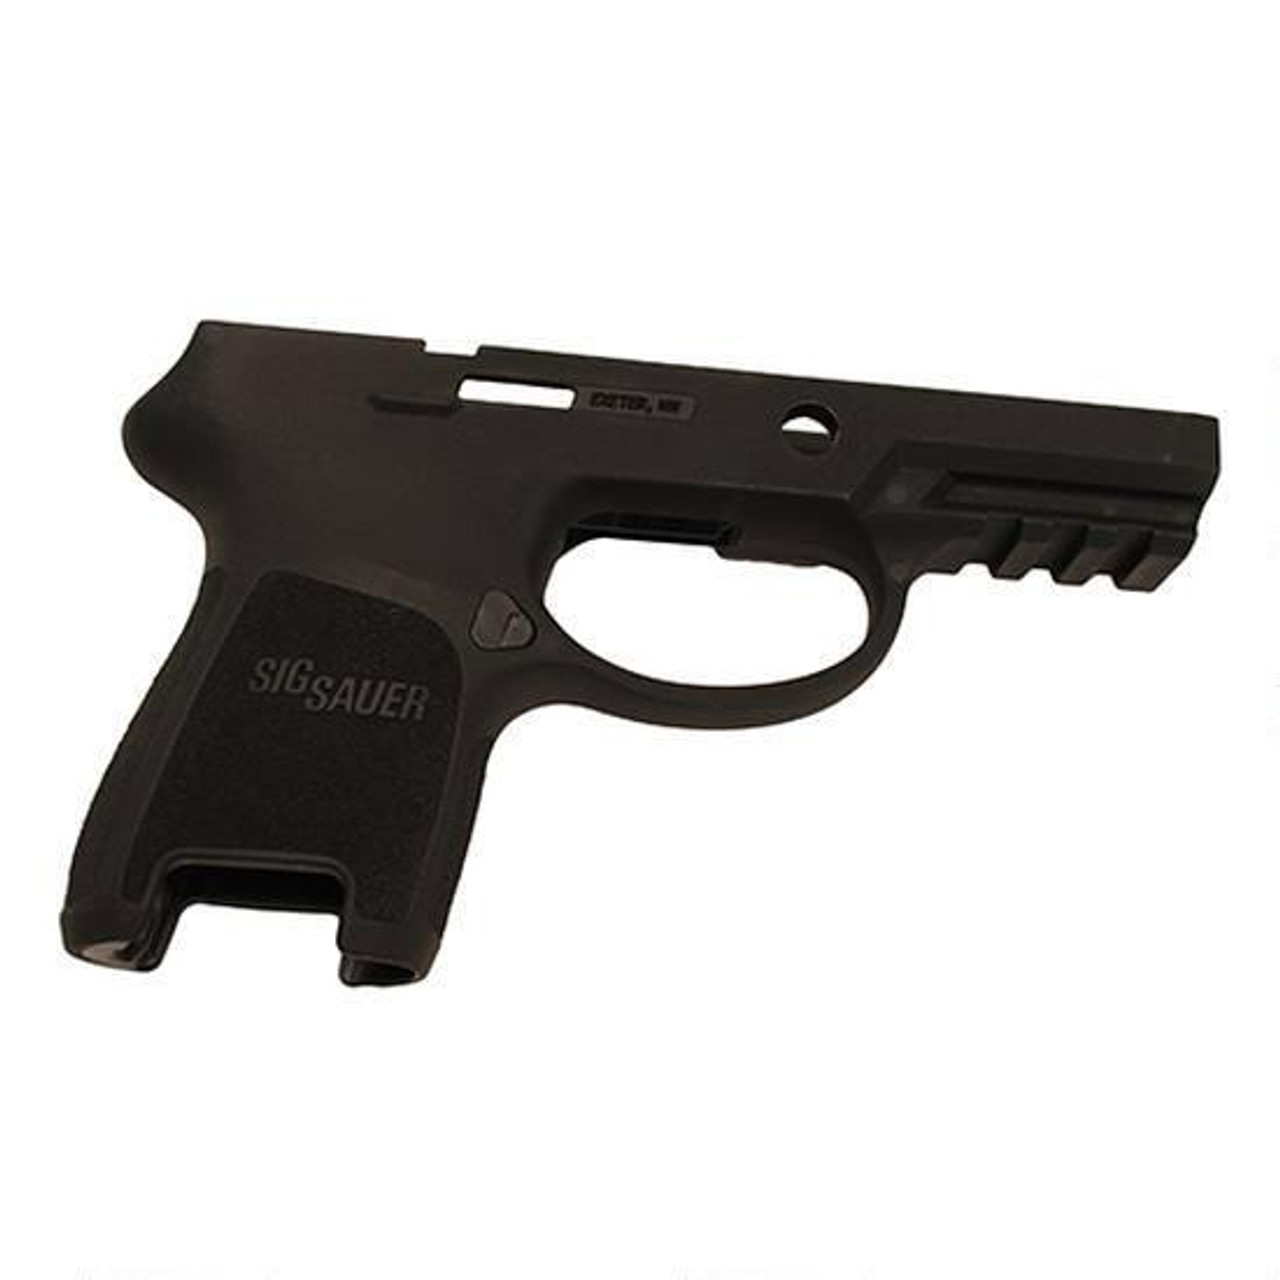 Sig Sauer P320 P250 Grip Module, Subcompact, Black - GRIP-MOD-SCR-943-M-BLK